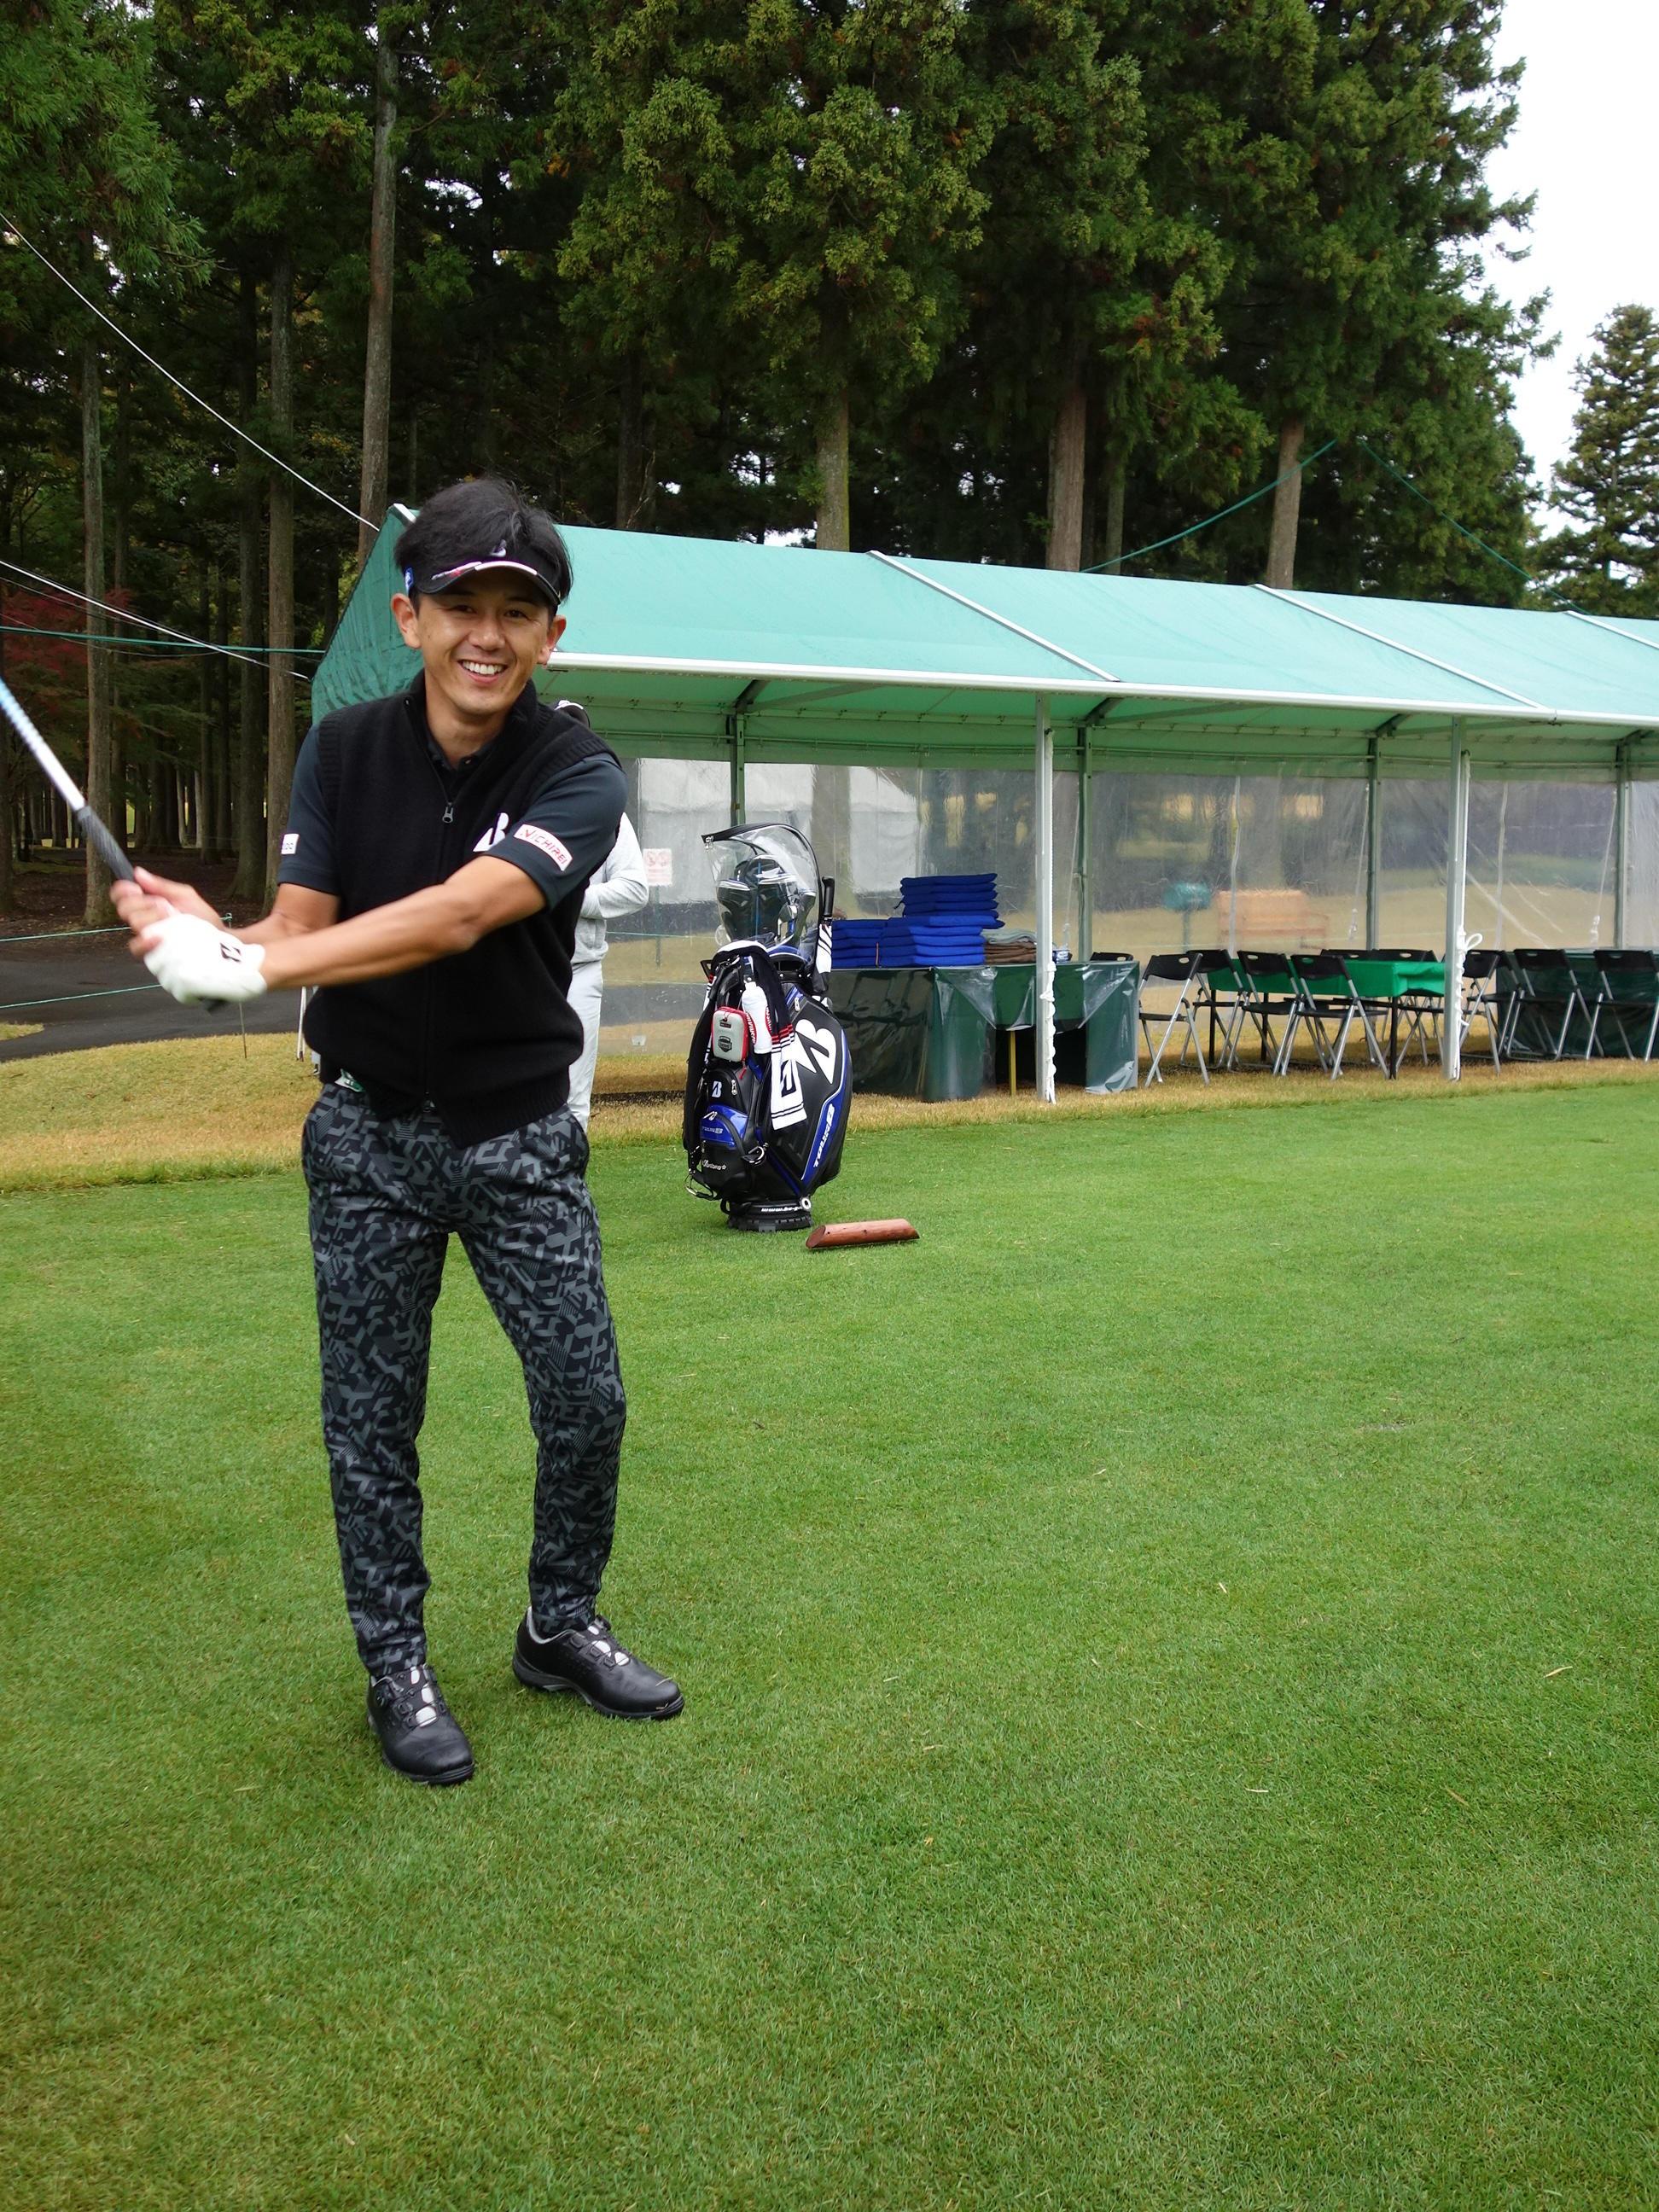 http://www.bs-golf.com/pro/441341cf658c3e91f382e111addb4c663464ef08.JPG